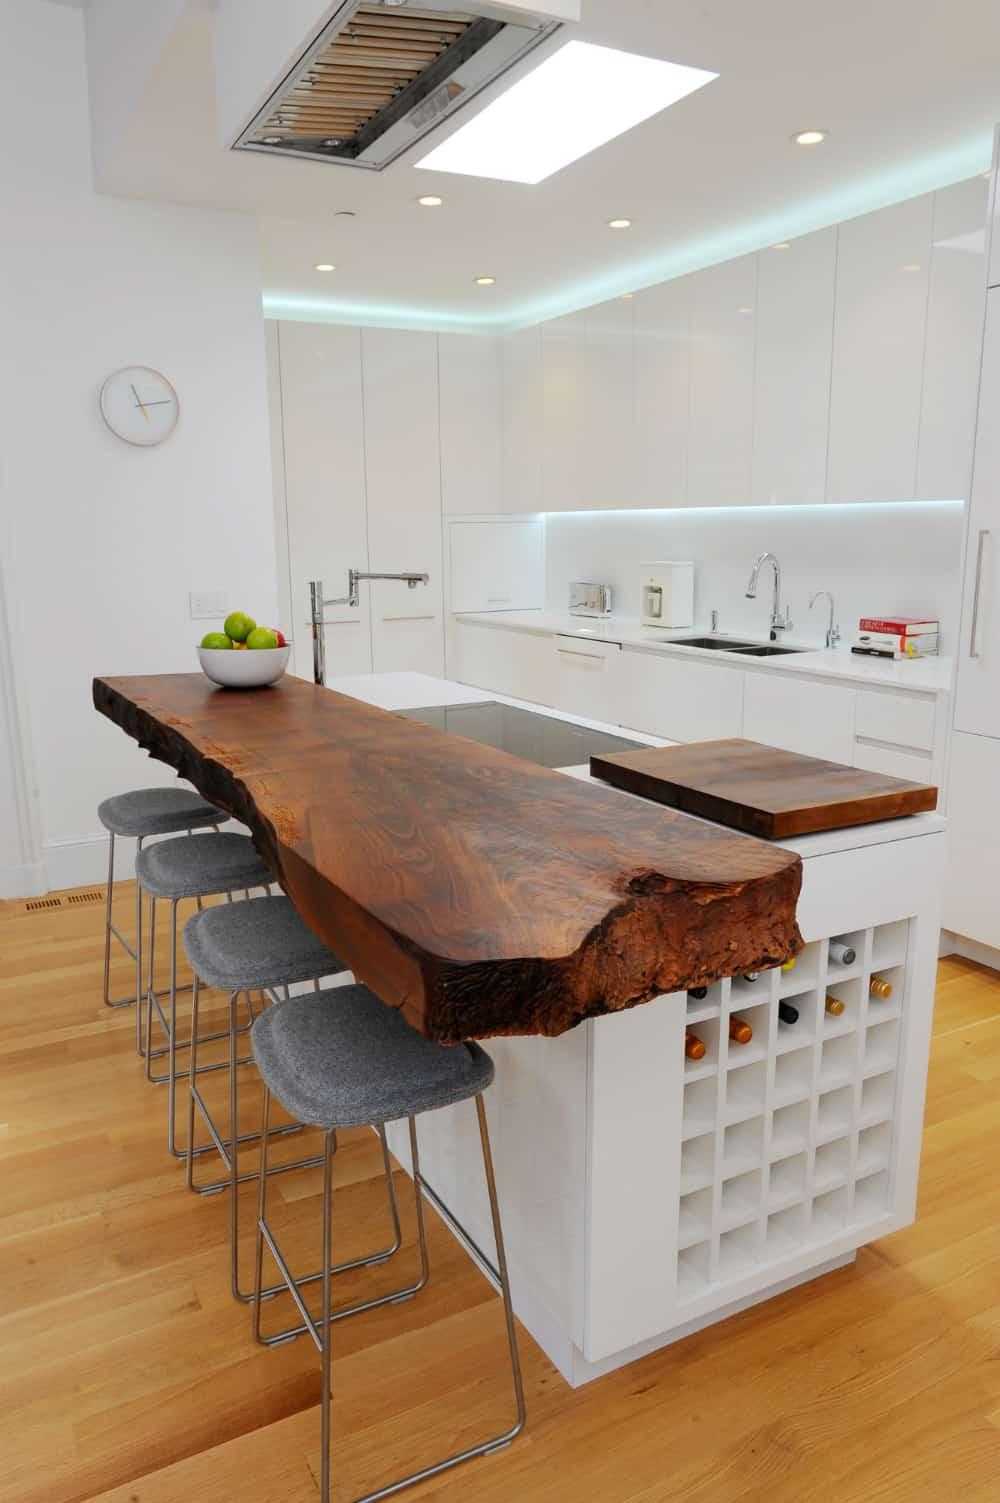 Live-edge kitchen countertop